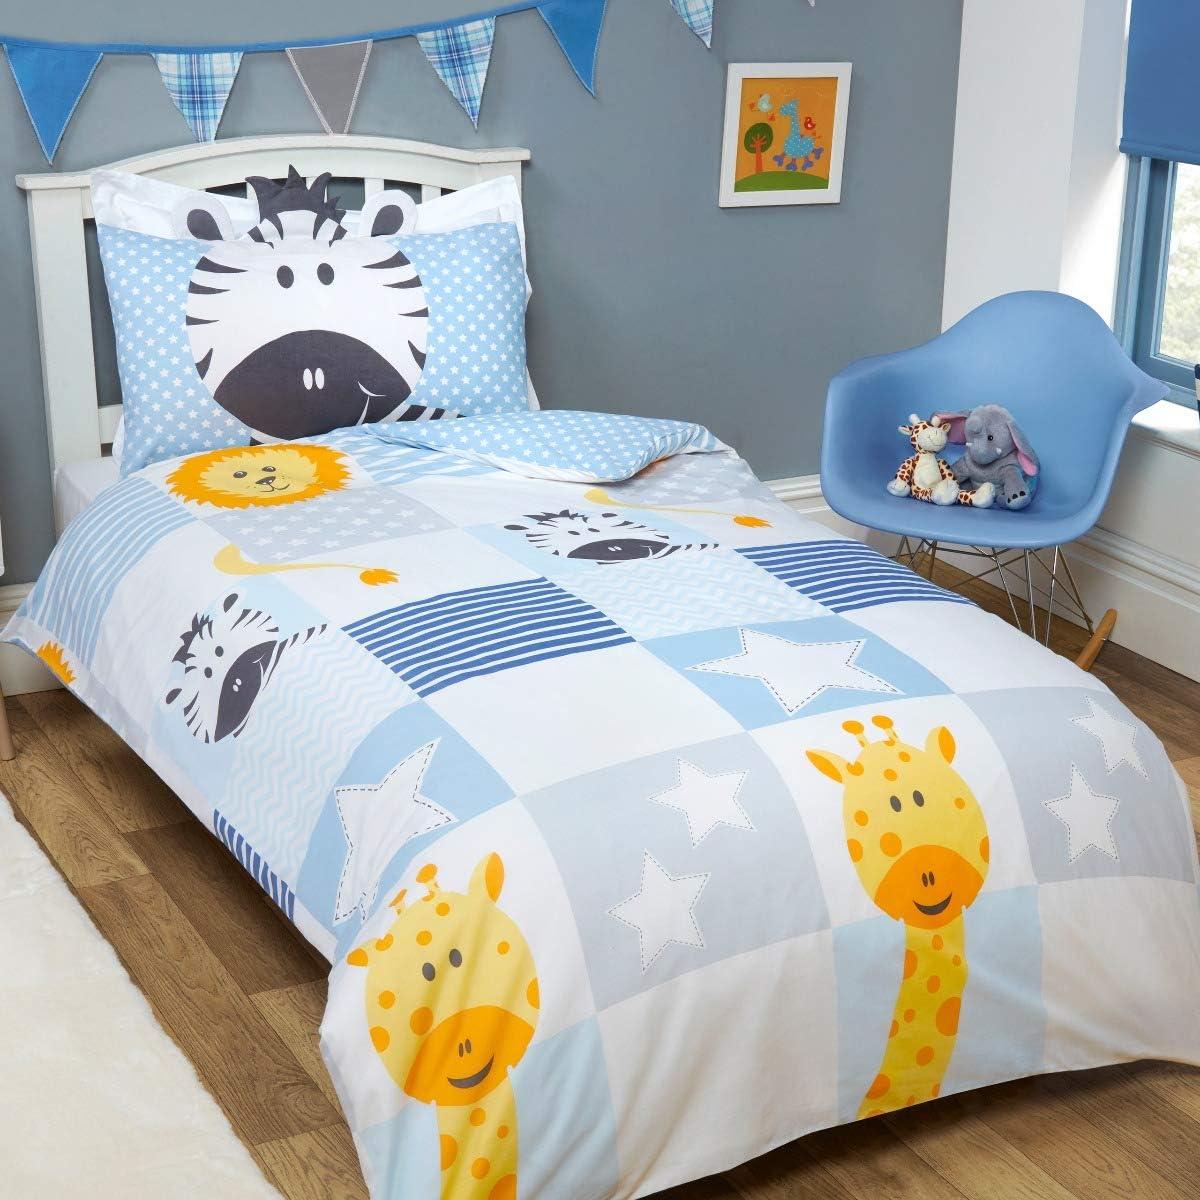 Toddler Patchwork Duvet Cover Bedding Set and Pillowcase Toddler Single Teddy